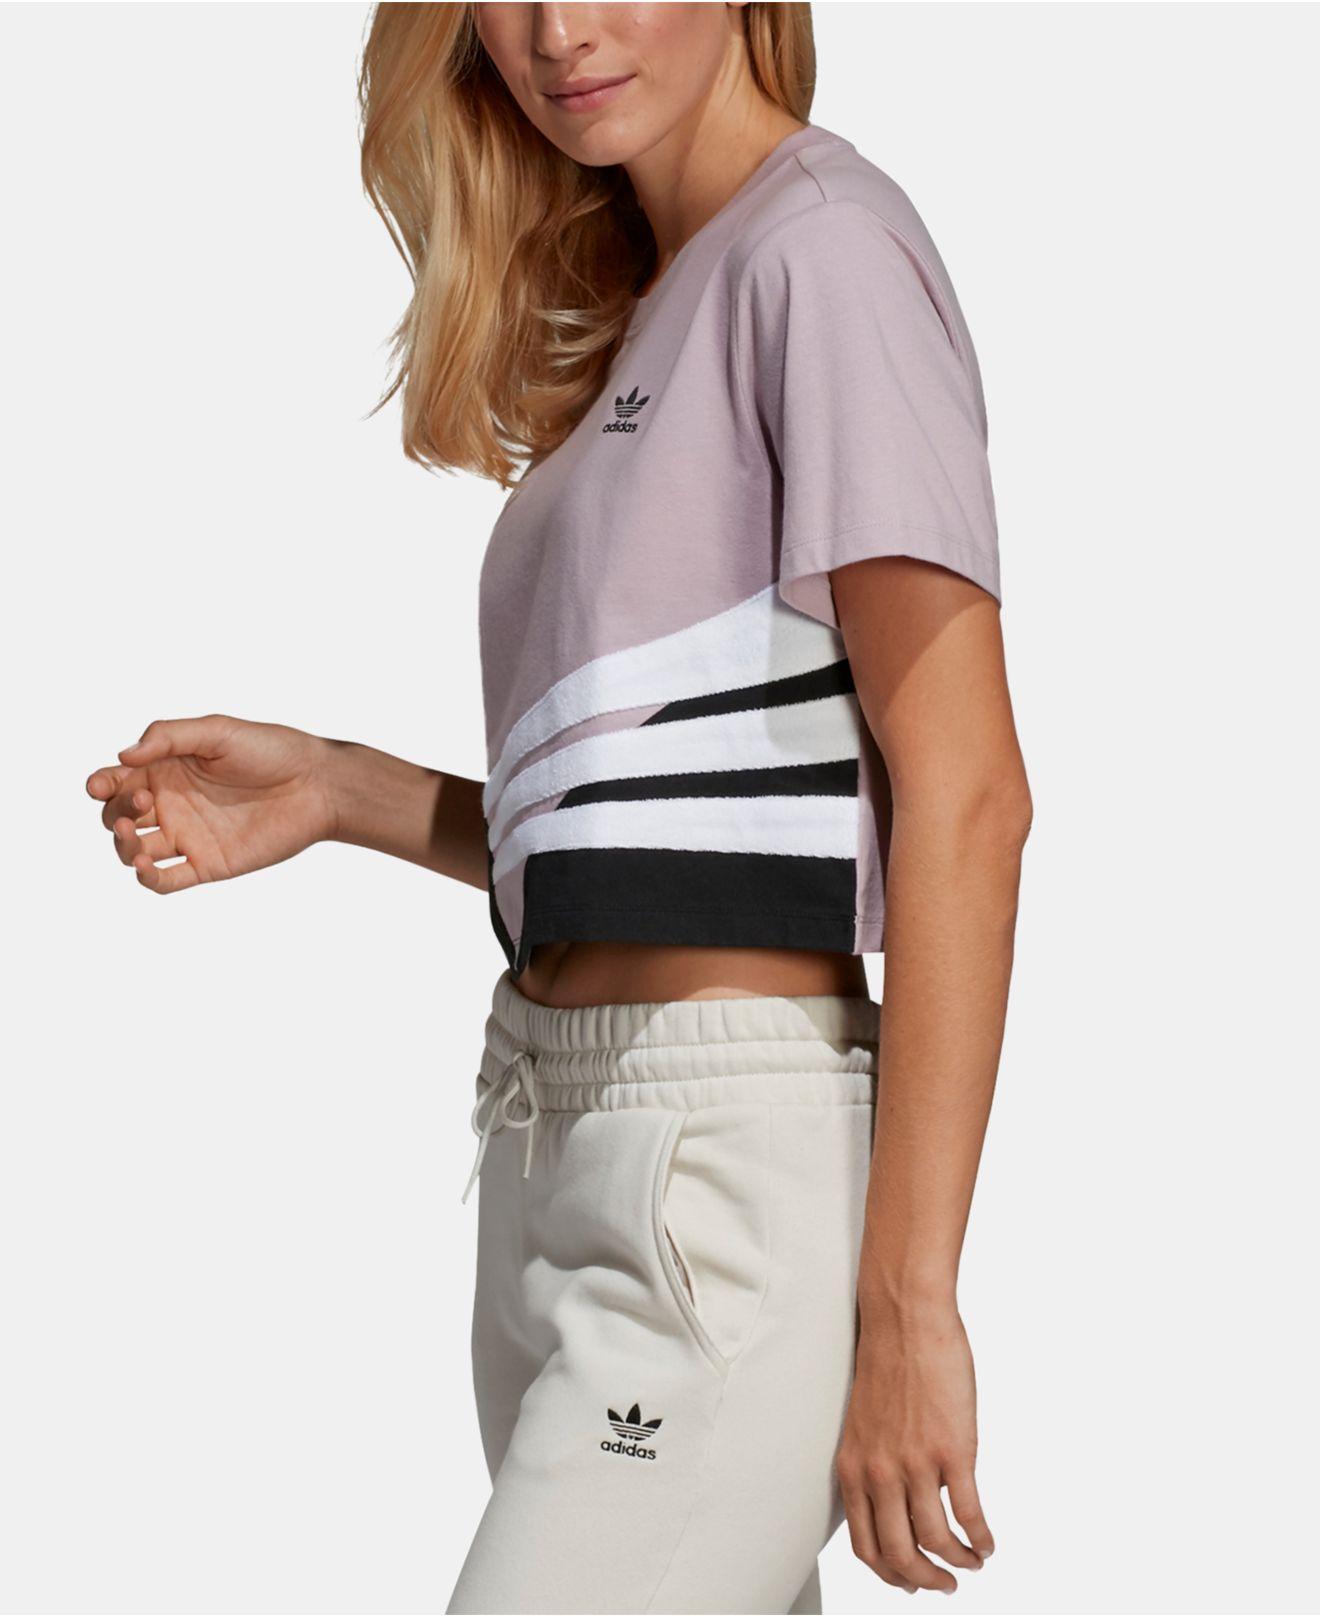 c5468620 Adidas Multicolor Originals Bossy 90s Cropped T-shirt